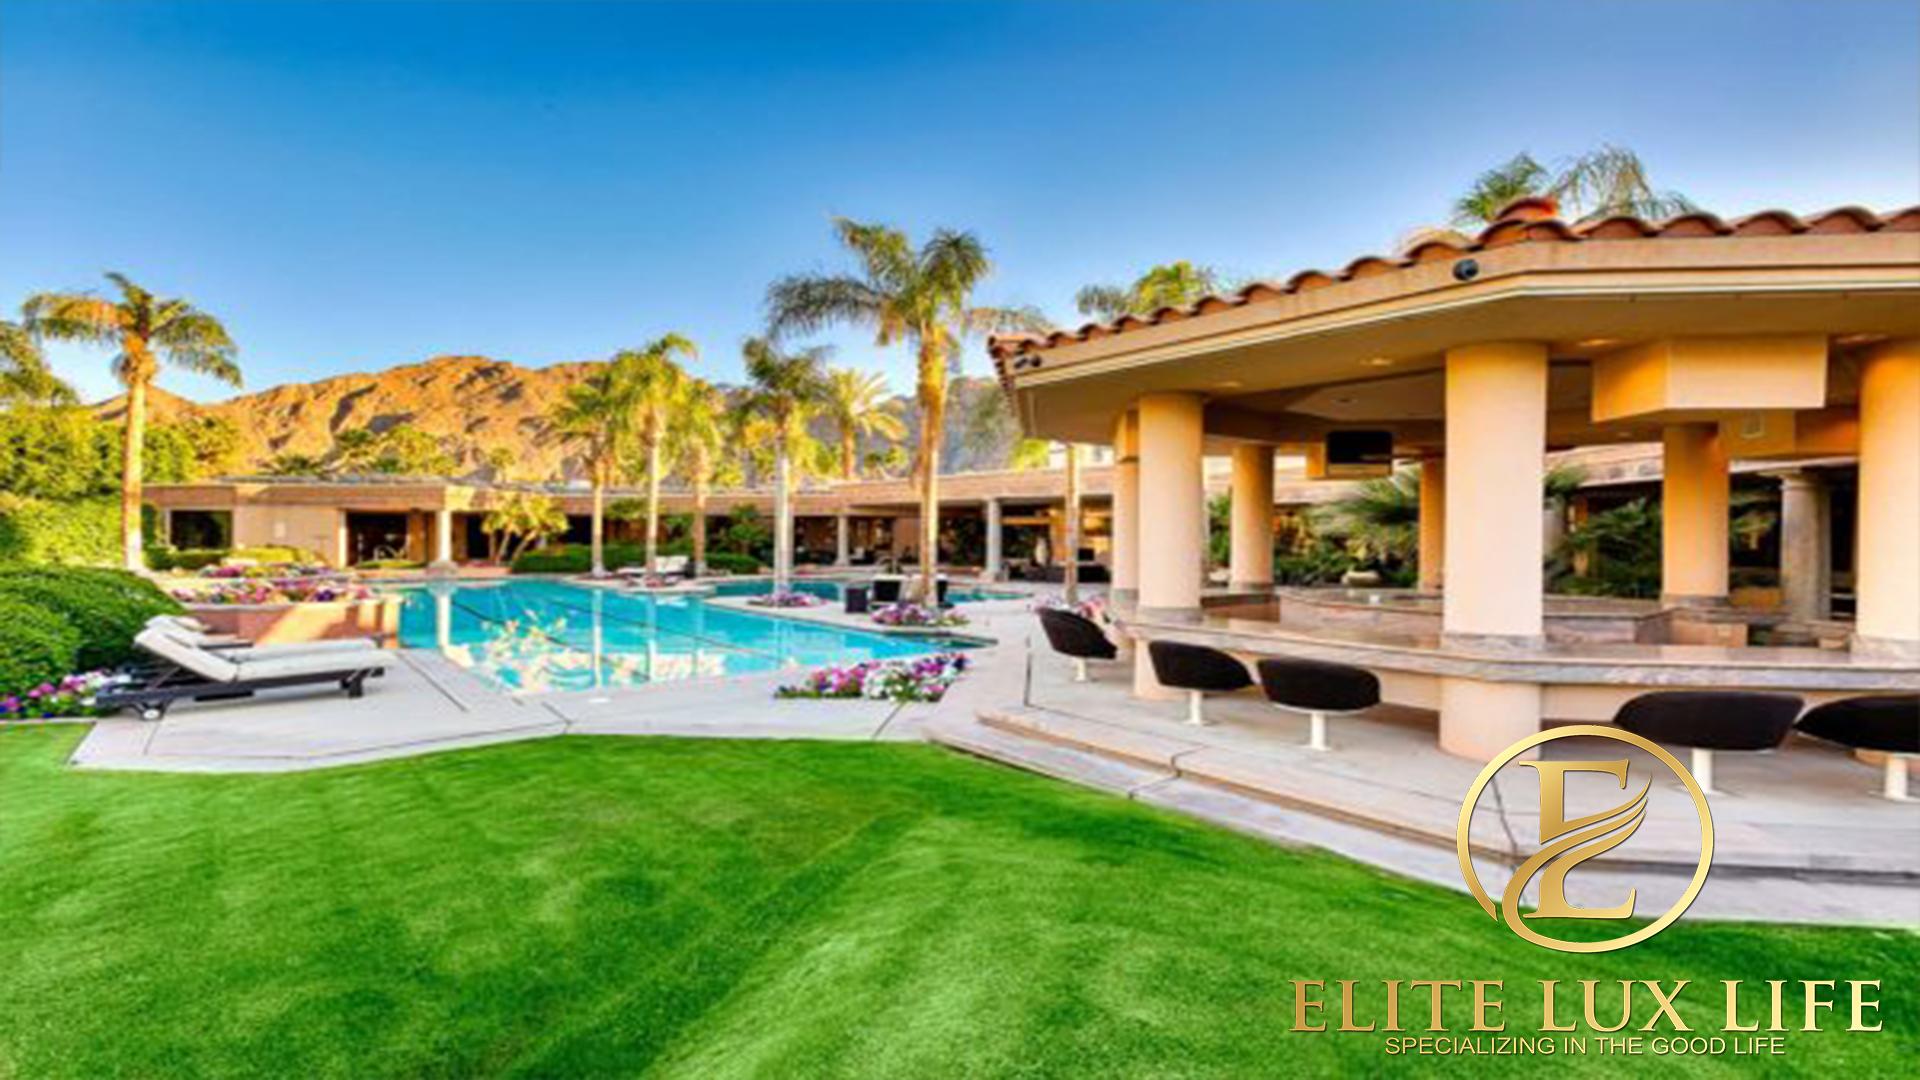 Delgado Elite Lux Estate 7